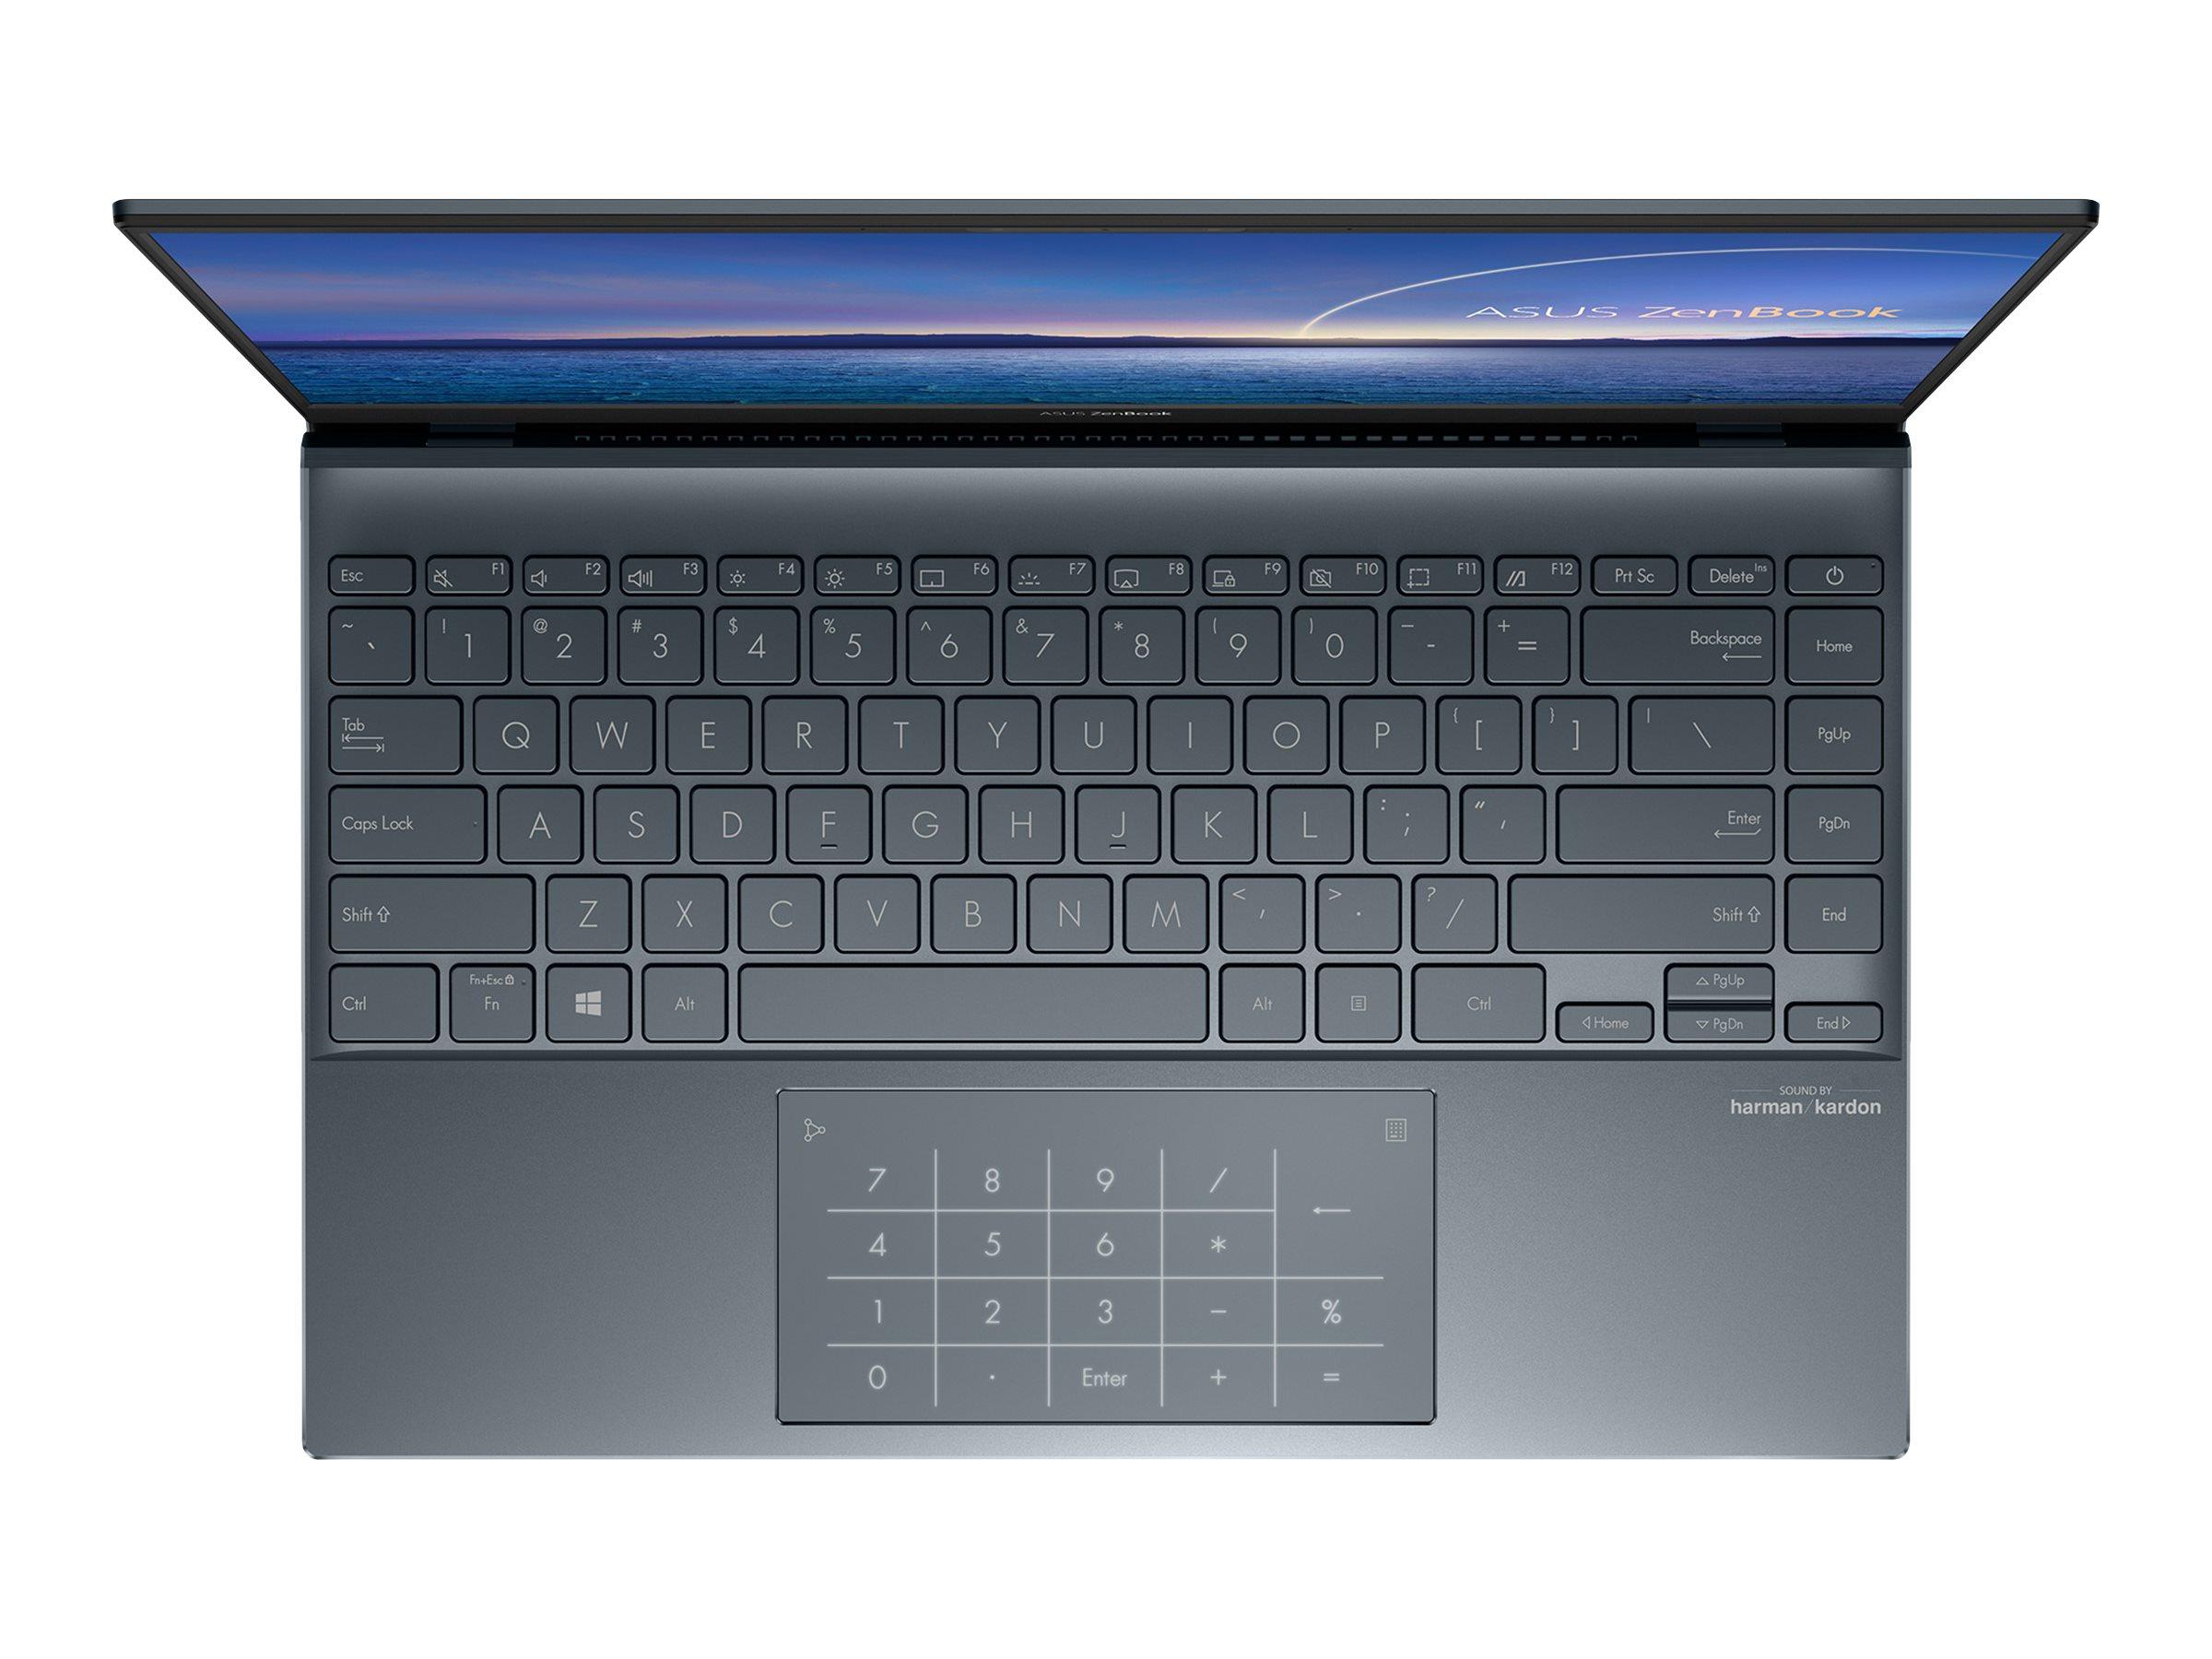 "ASUS ZenBook 14 UX425JA-HM027R - Core i7 1065G7 / 1.3 GHz - Win 10 Pro - 16 GB RAM - 1 TB SSD NVMe - 35.6 cm (14"")"